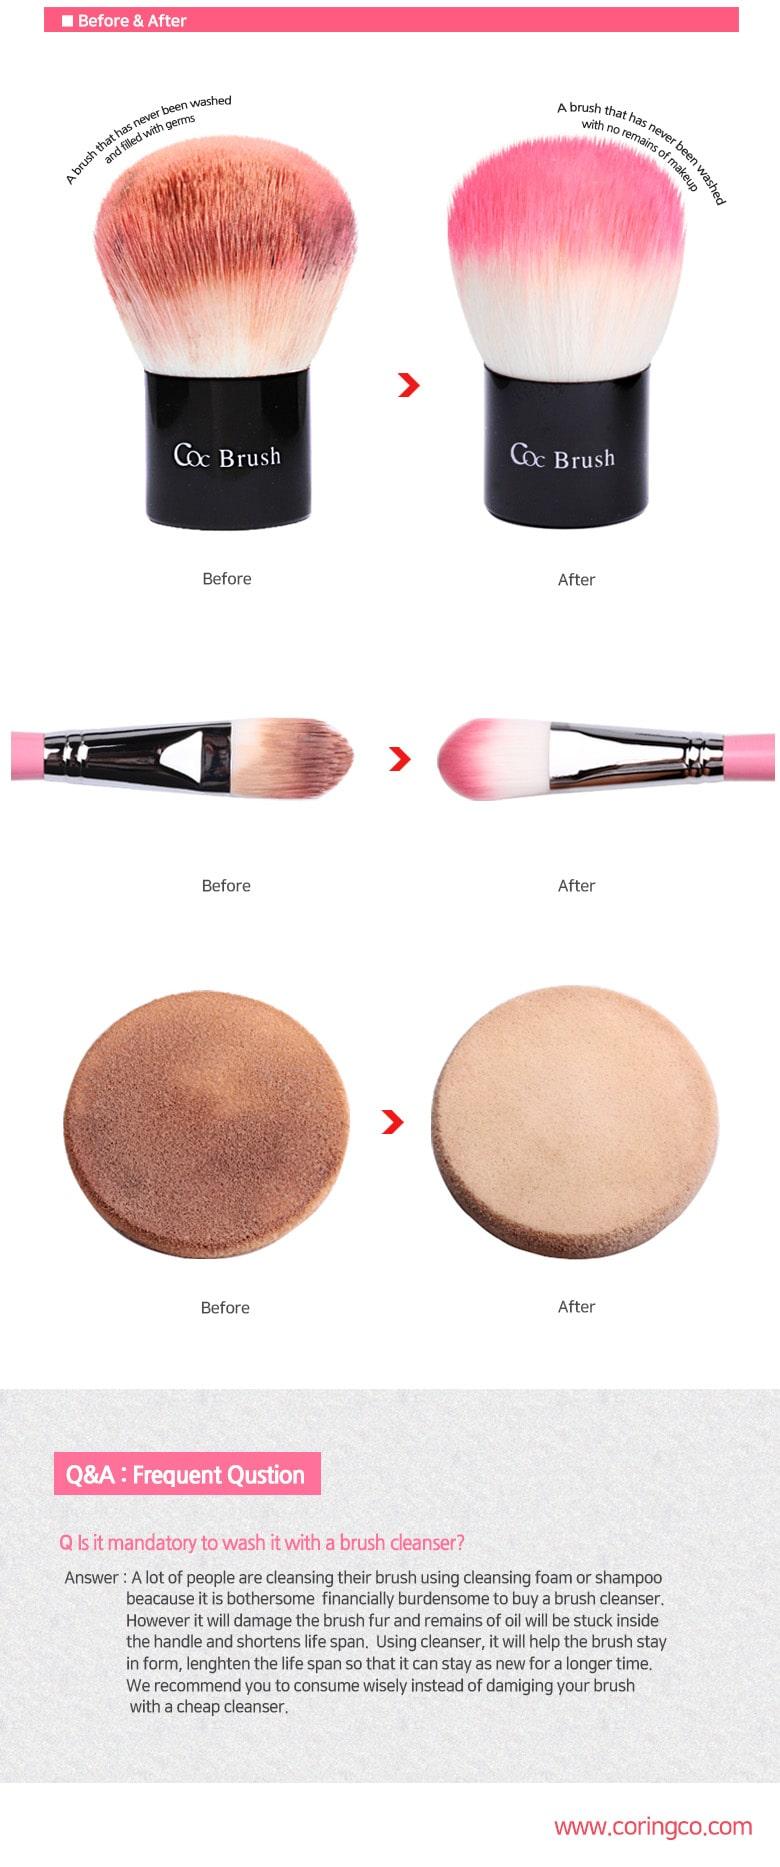 Brush Cleanser - Comparison